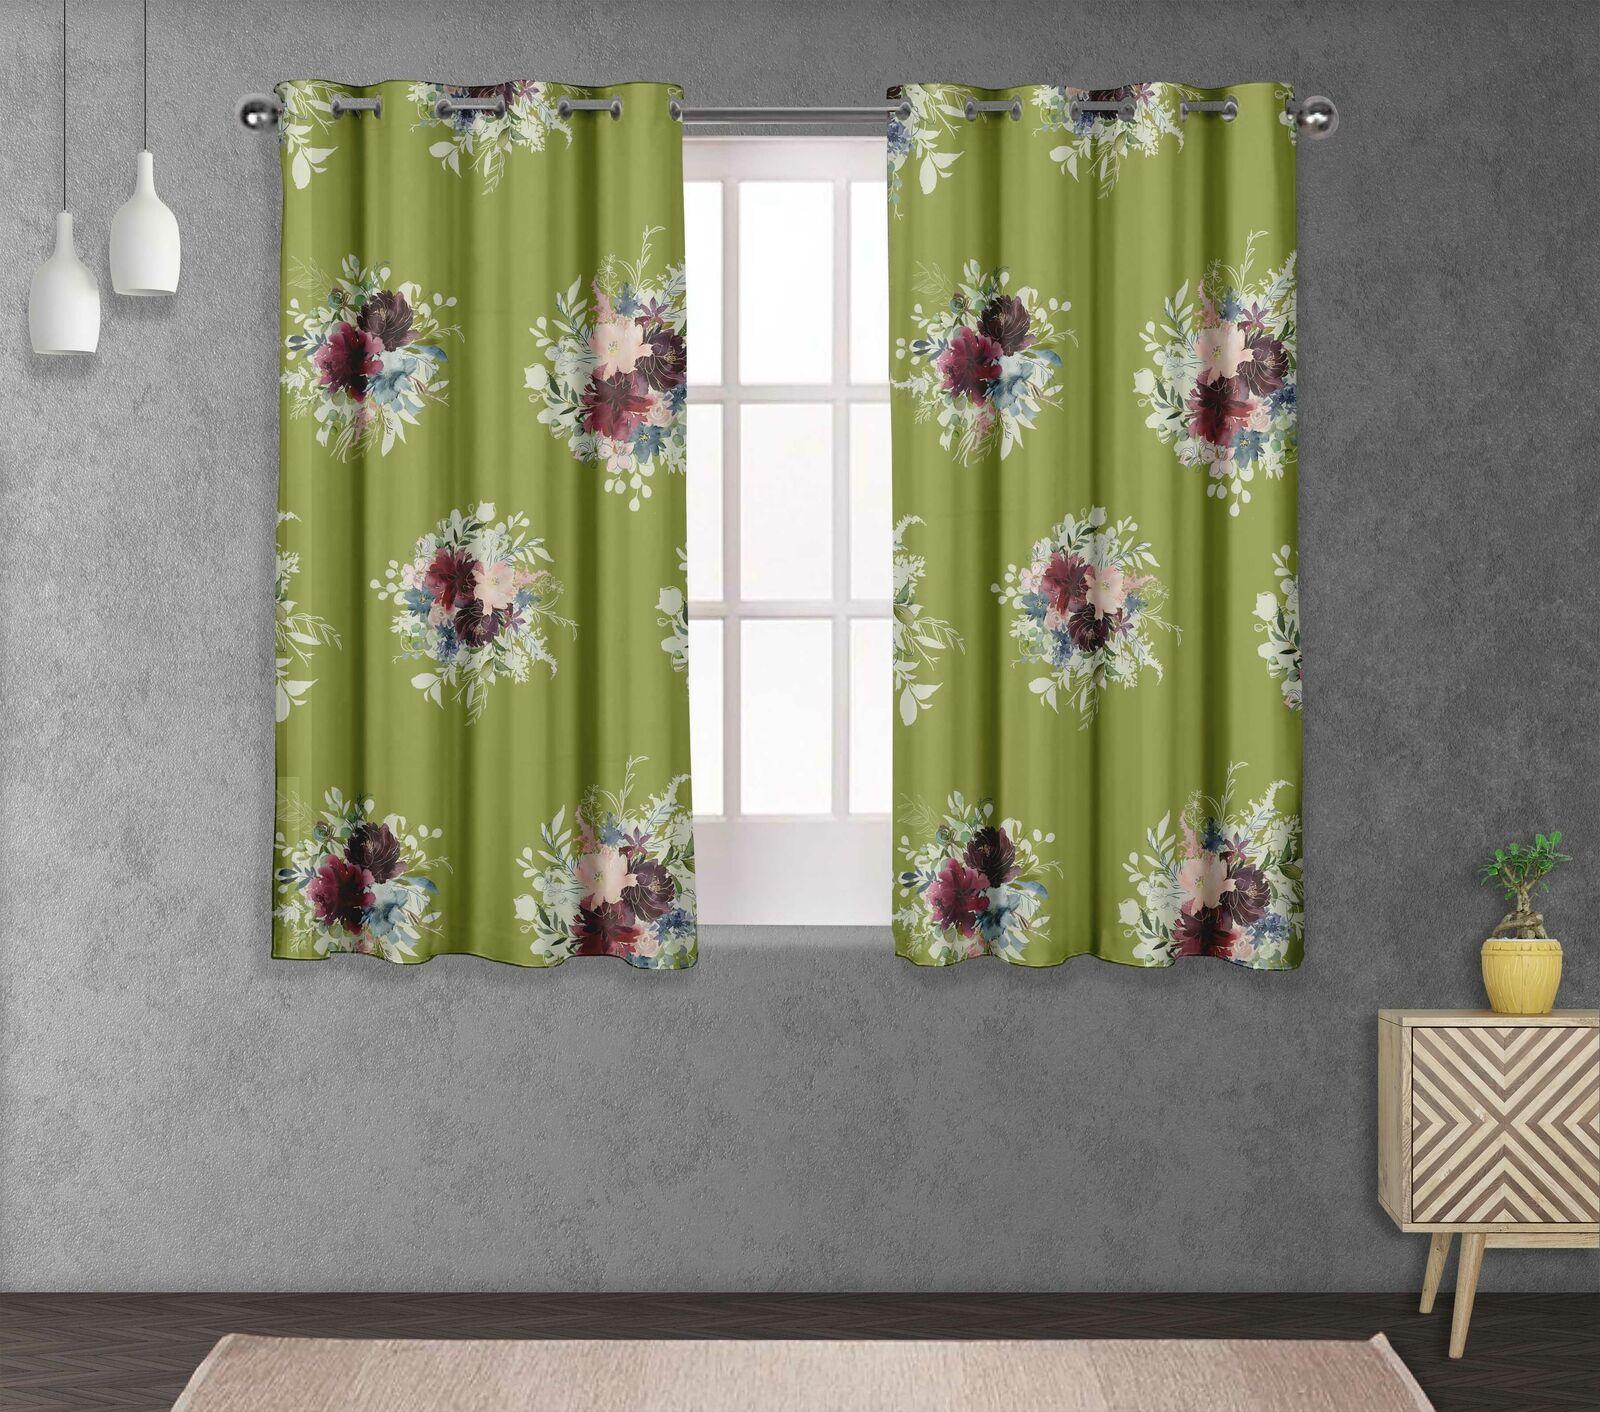 S4sassy Leaves & Peony Home Decorative short & long Curtain Eyelet Panel-FL-620G